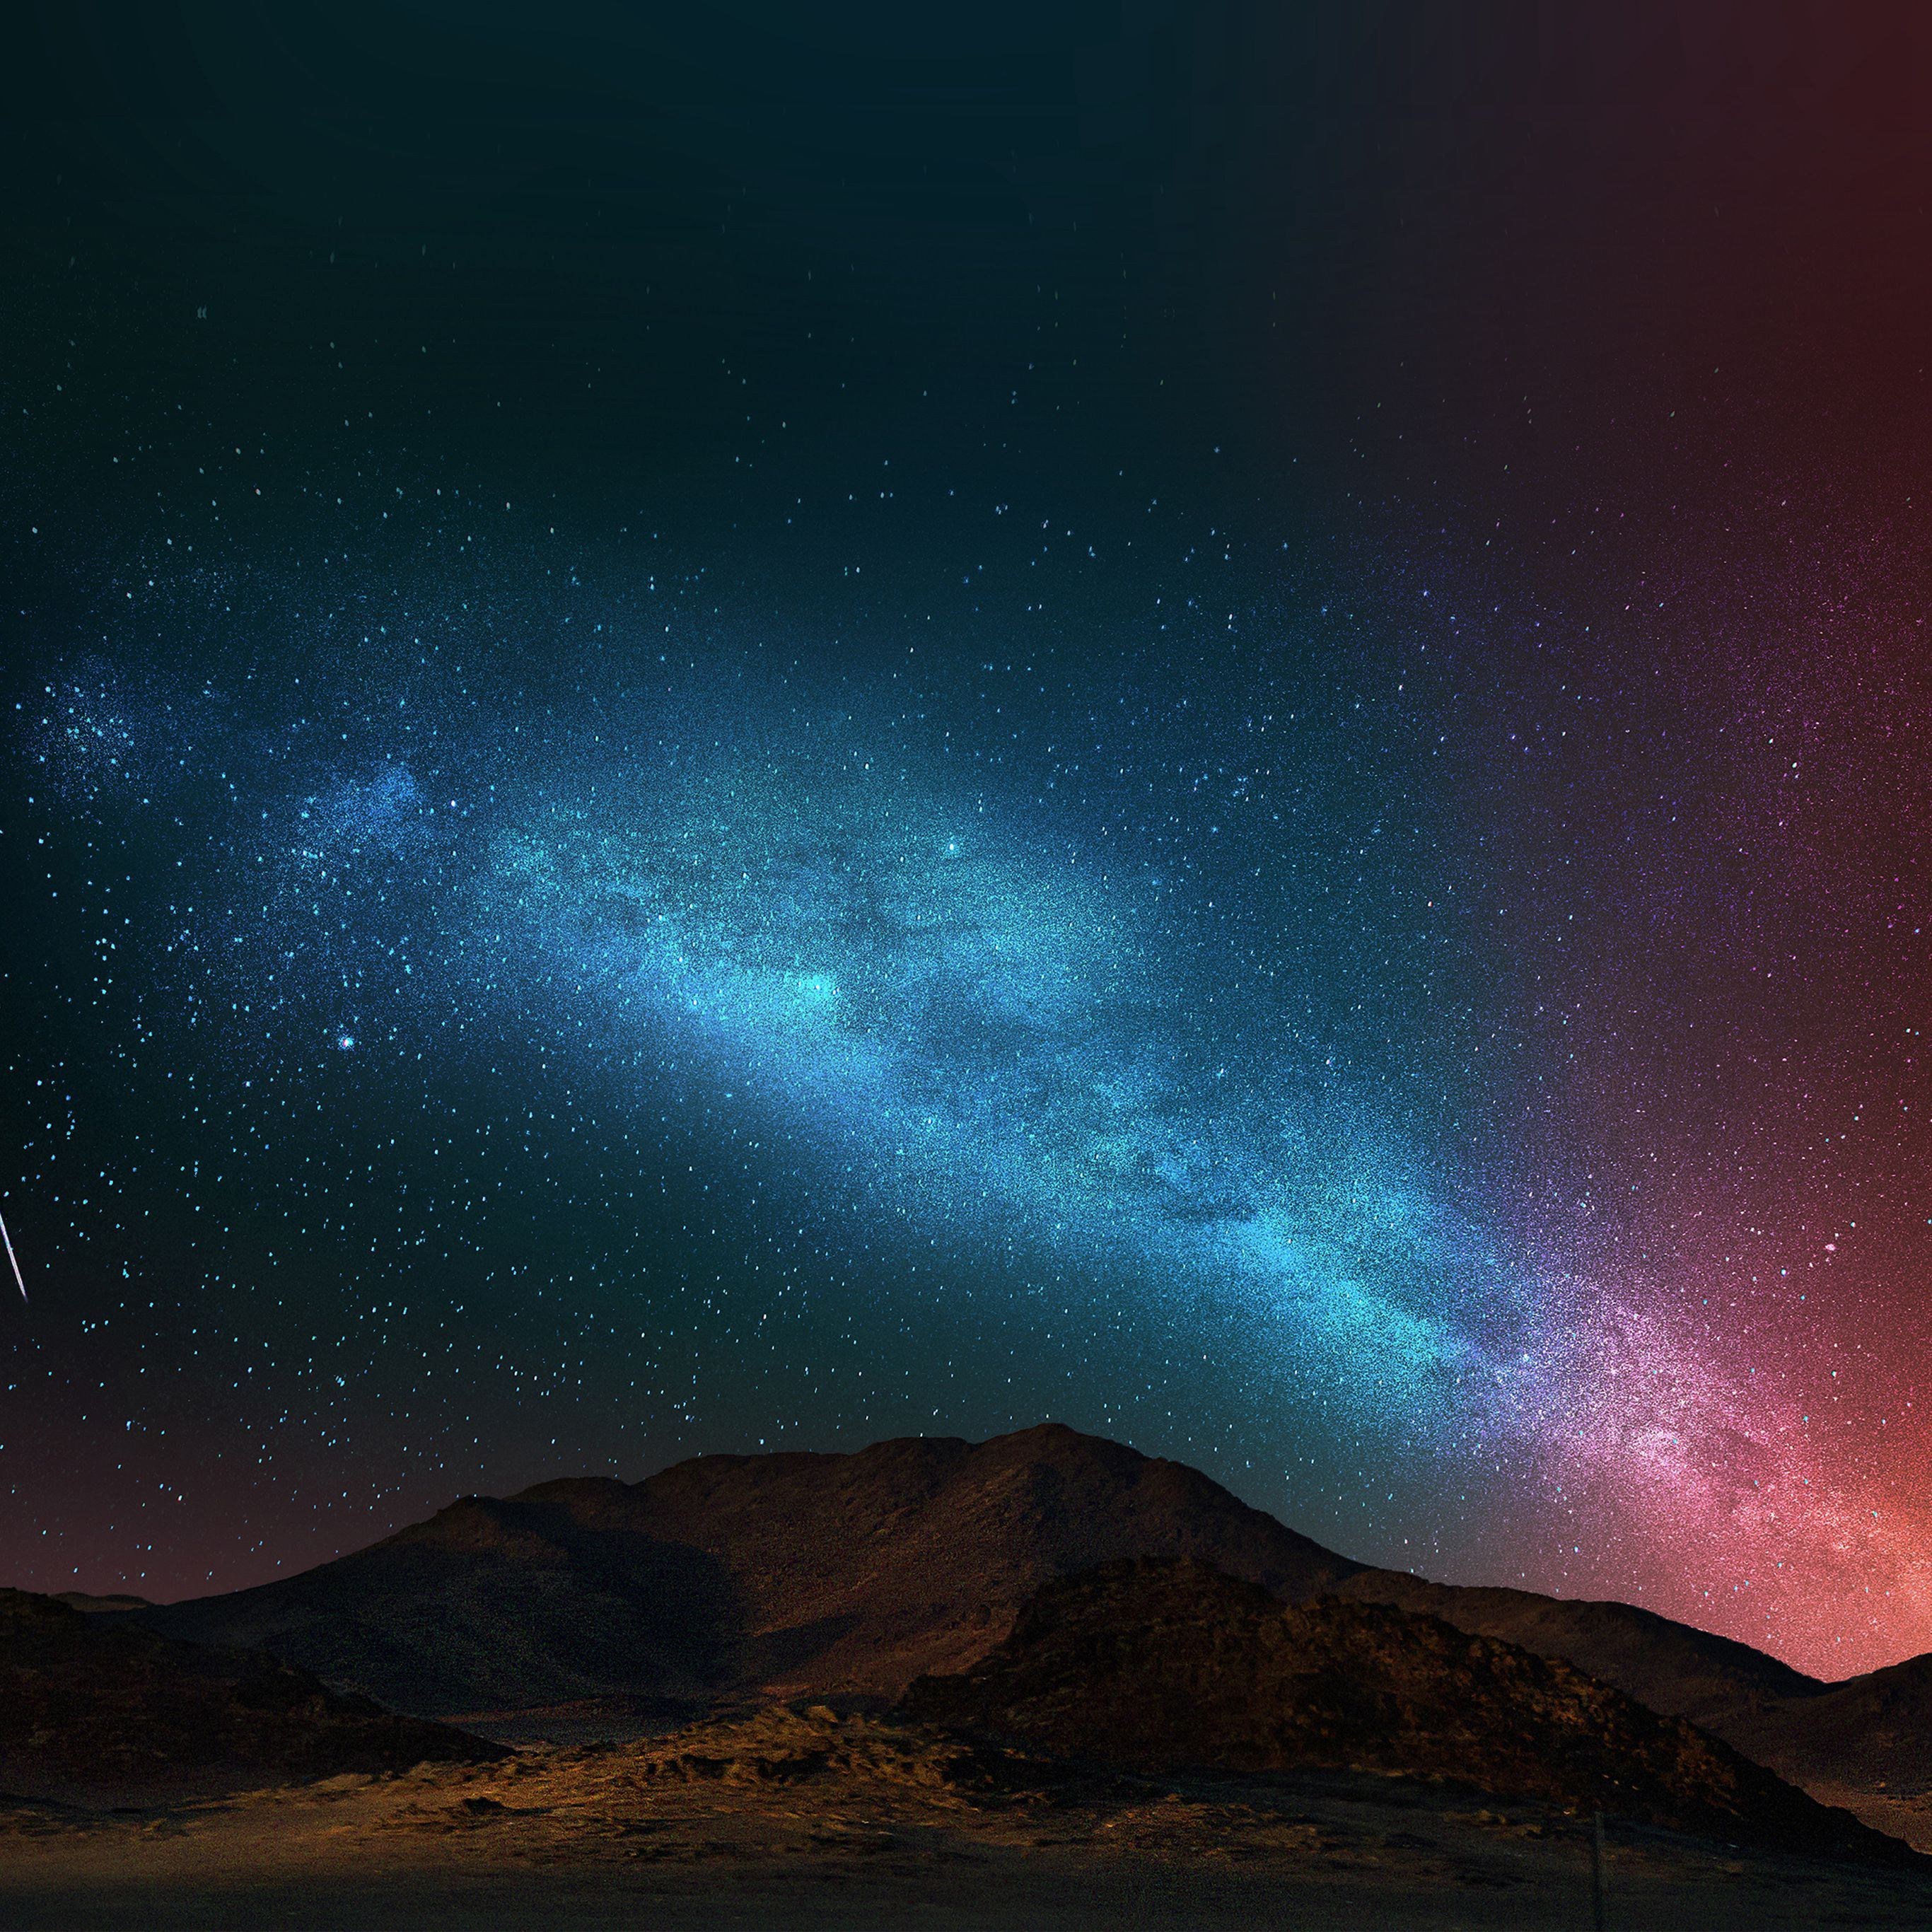 Night sky dark color star shining iPad Pro wallpaper